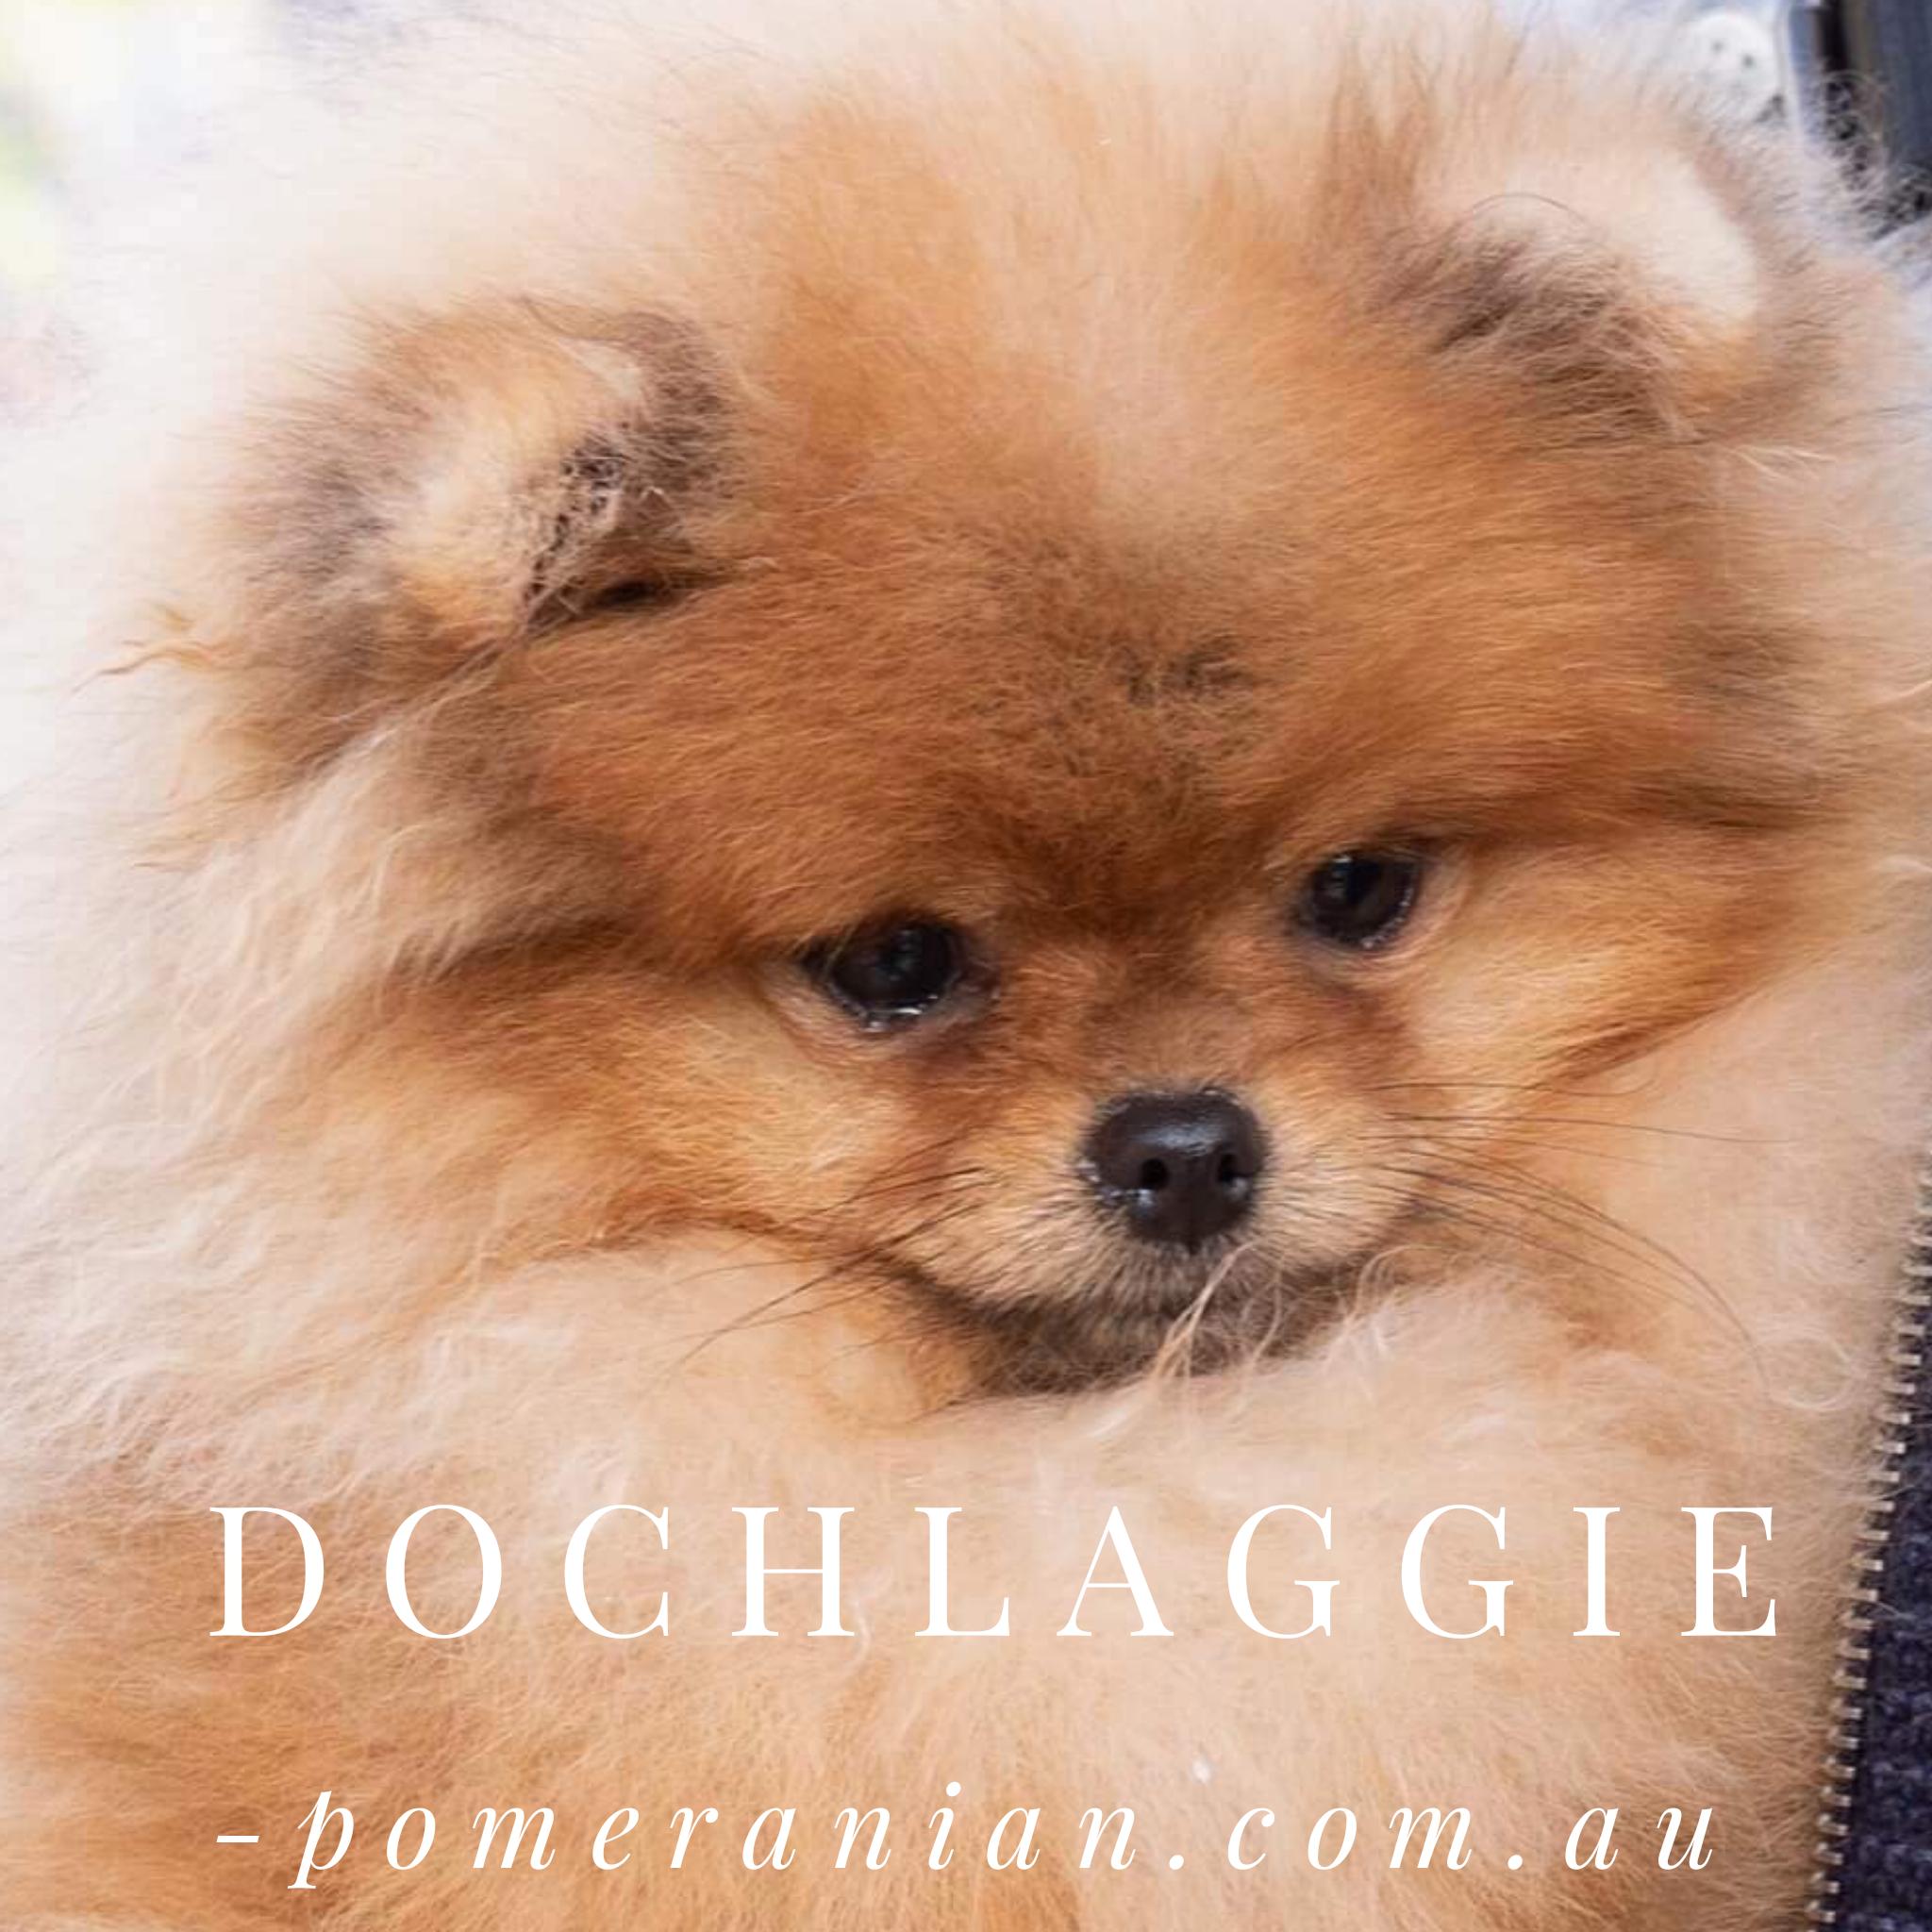 Dochlaggie Pomeranians Melbourne Australia In 2020 Pomeranian Puppy Pomeranian Pomeranian Dog